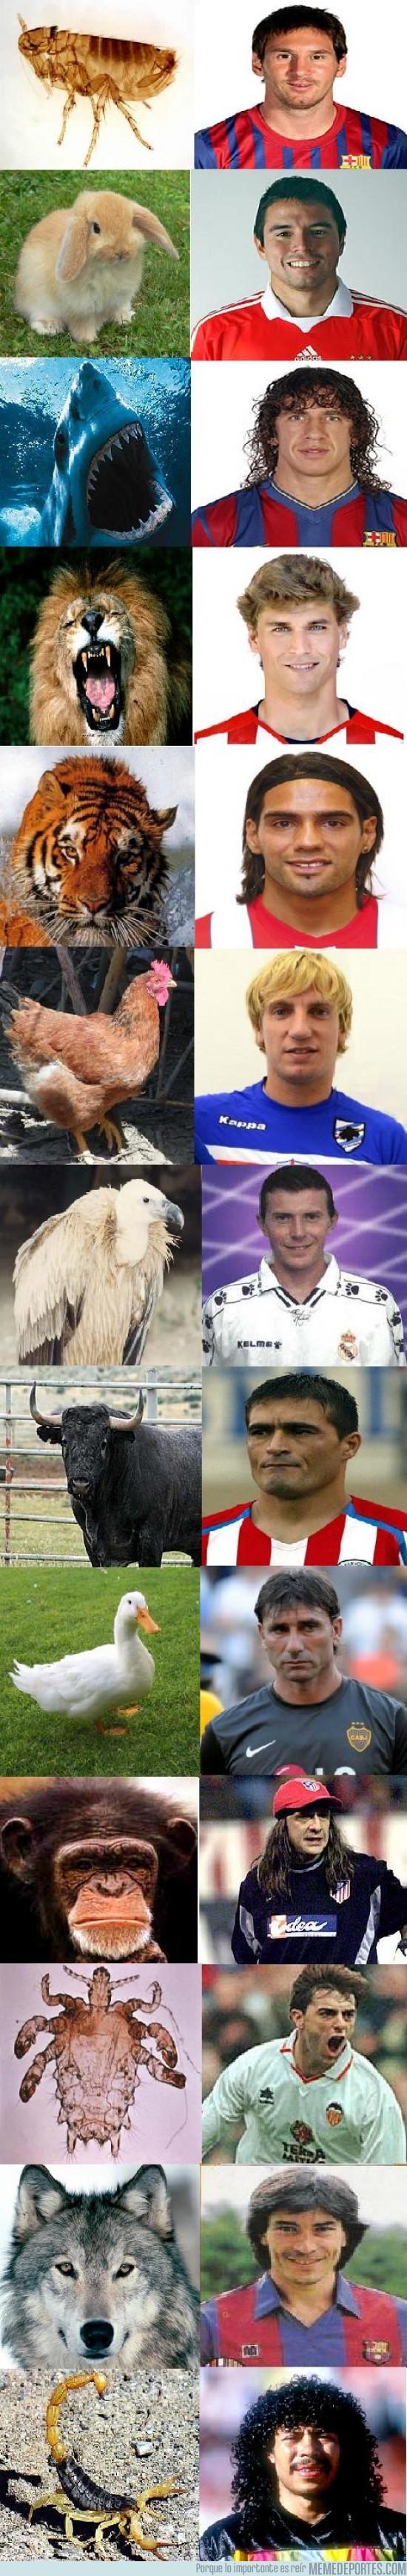 27711 - Futbolistas animales